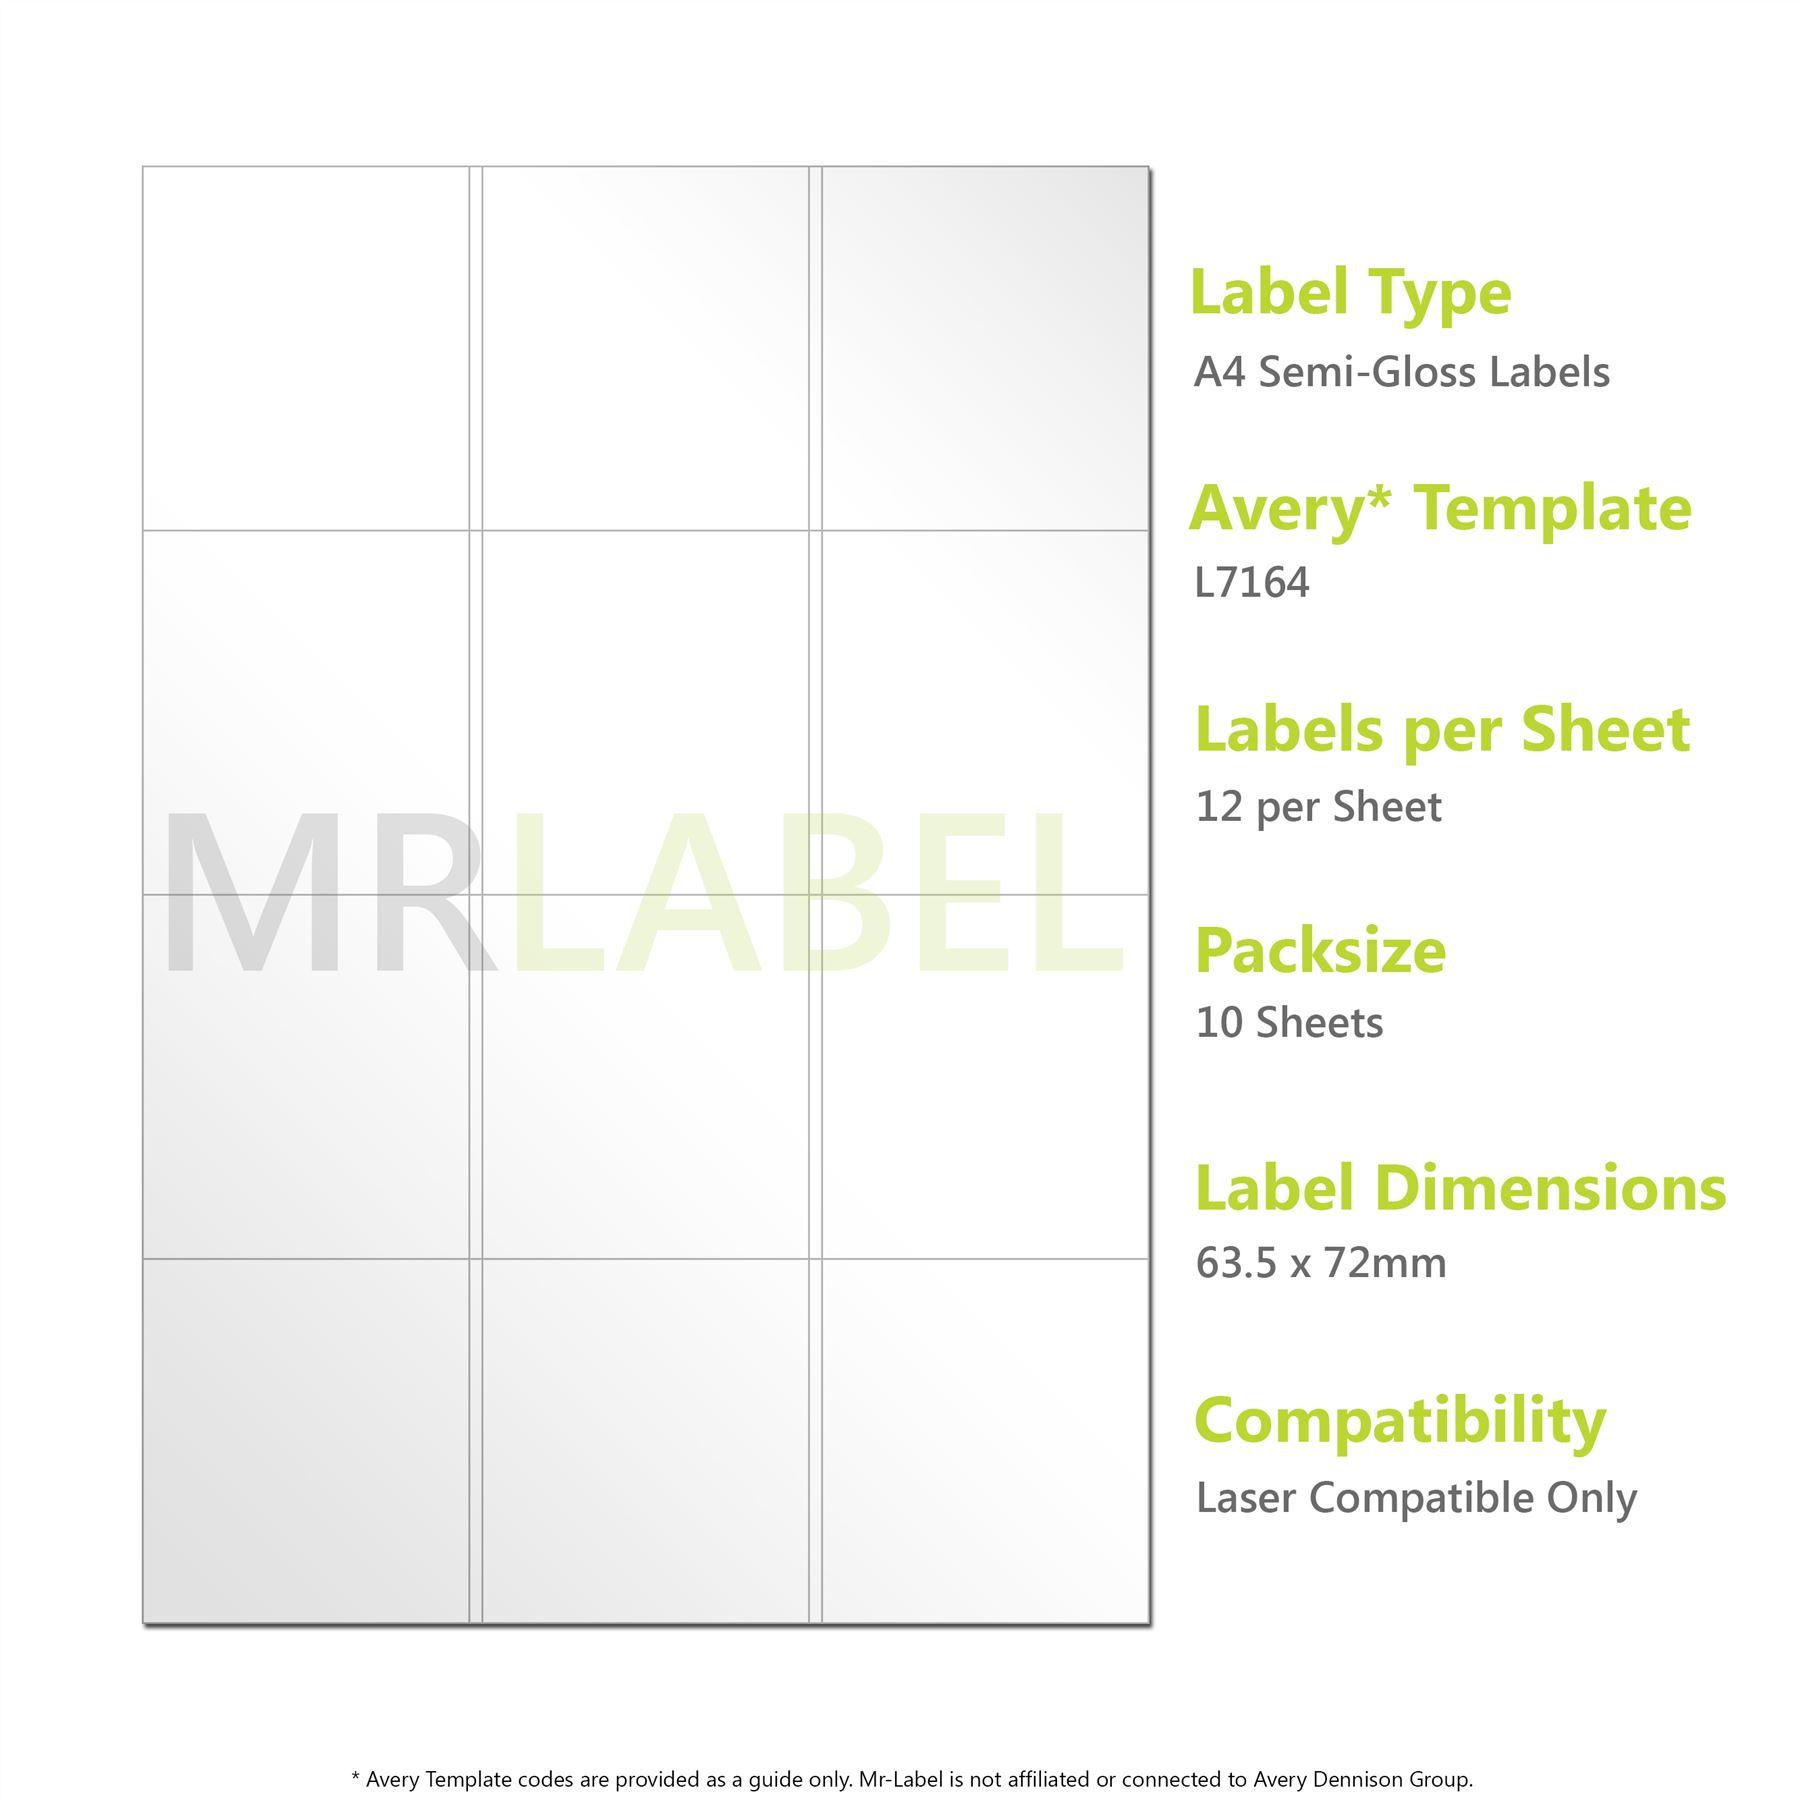 A4 Semi-Gloss Labels